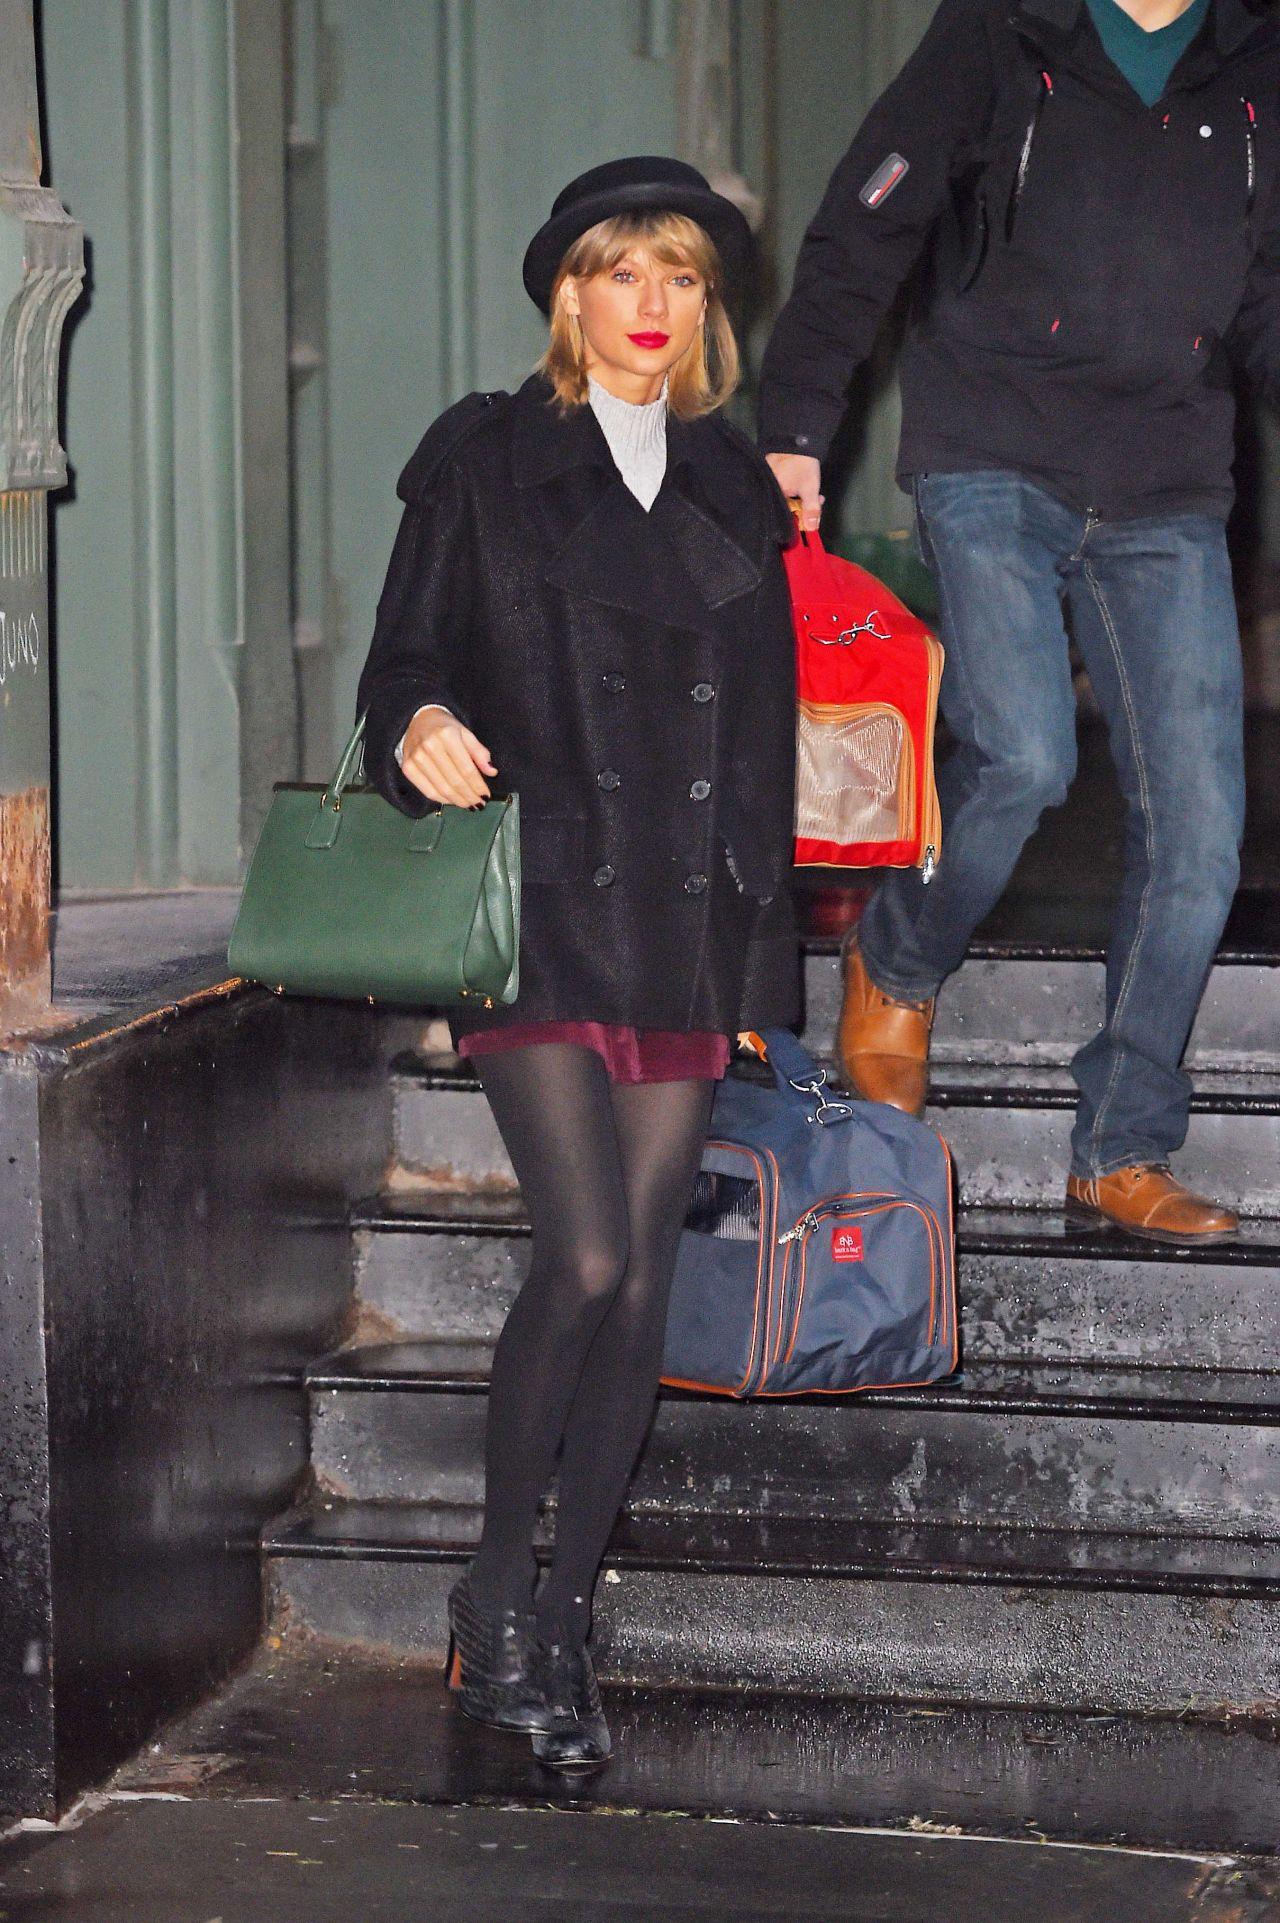 Taylor Swift - 2015 Celebrity Photos - Street Style ...